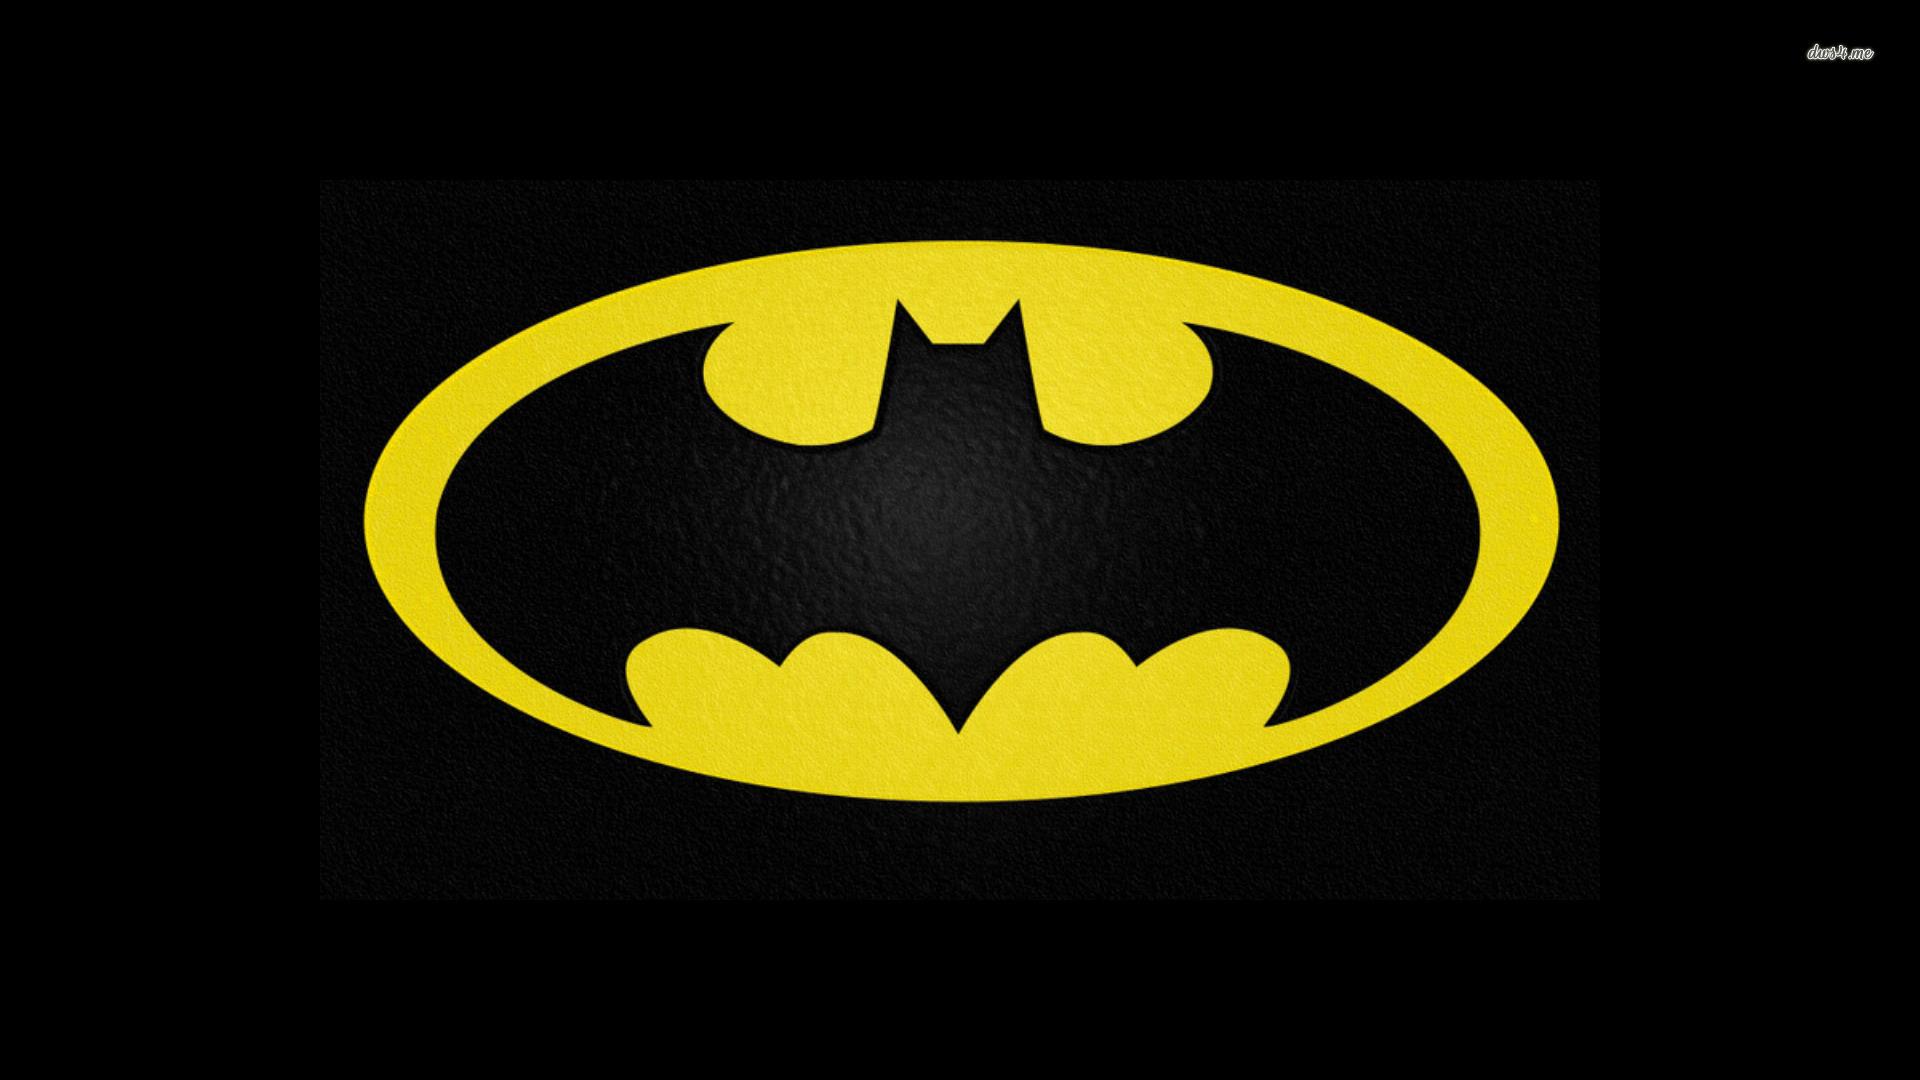 Batman logo wallpaper   Movie wallpapers   8411 1920x1080